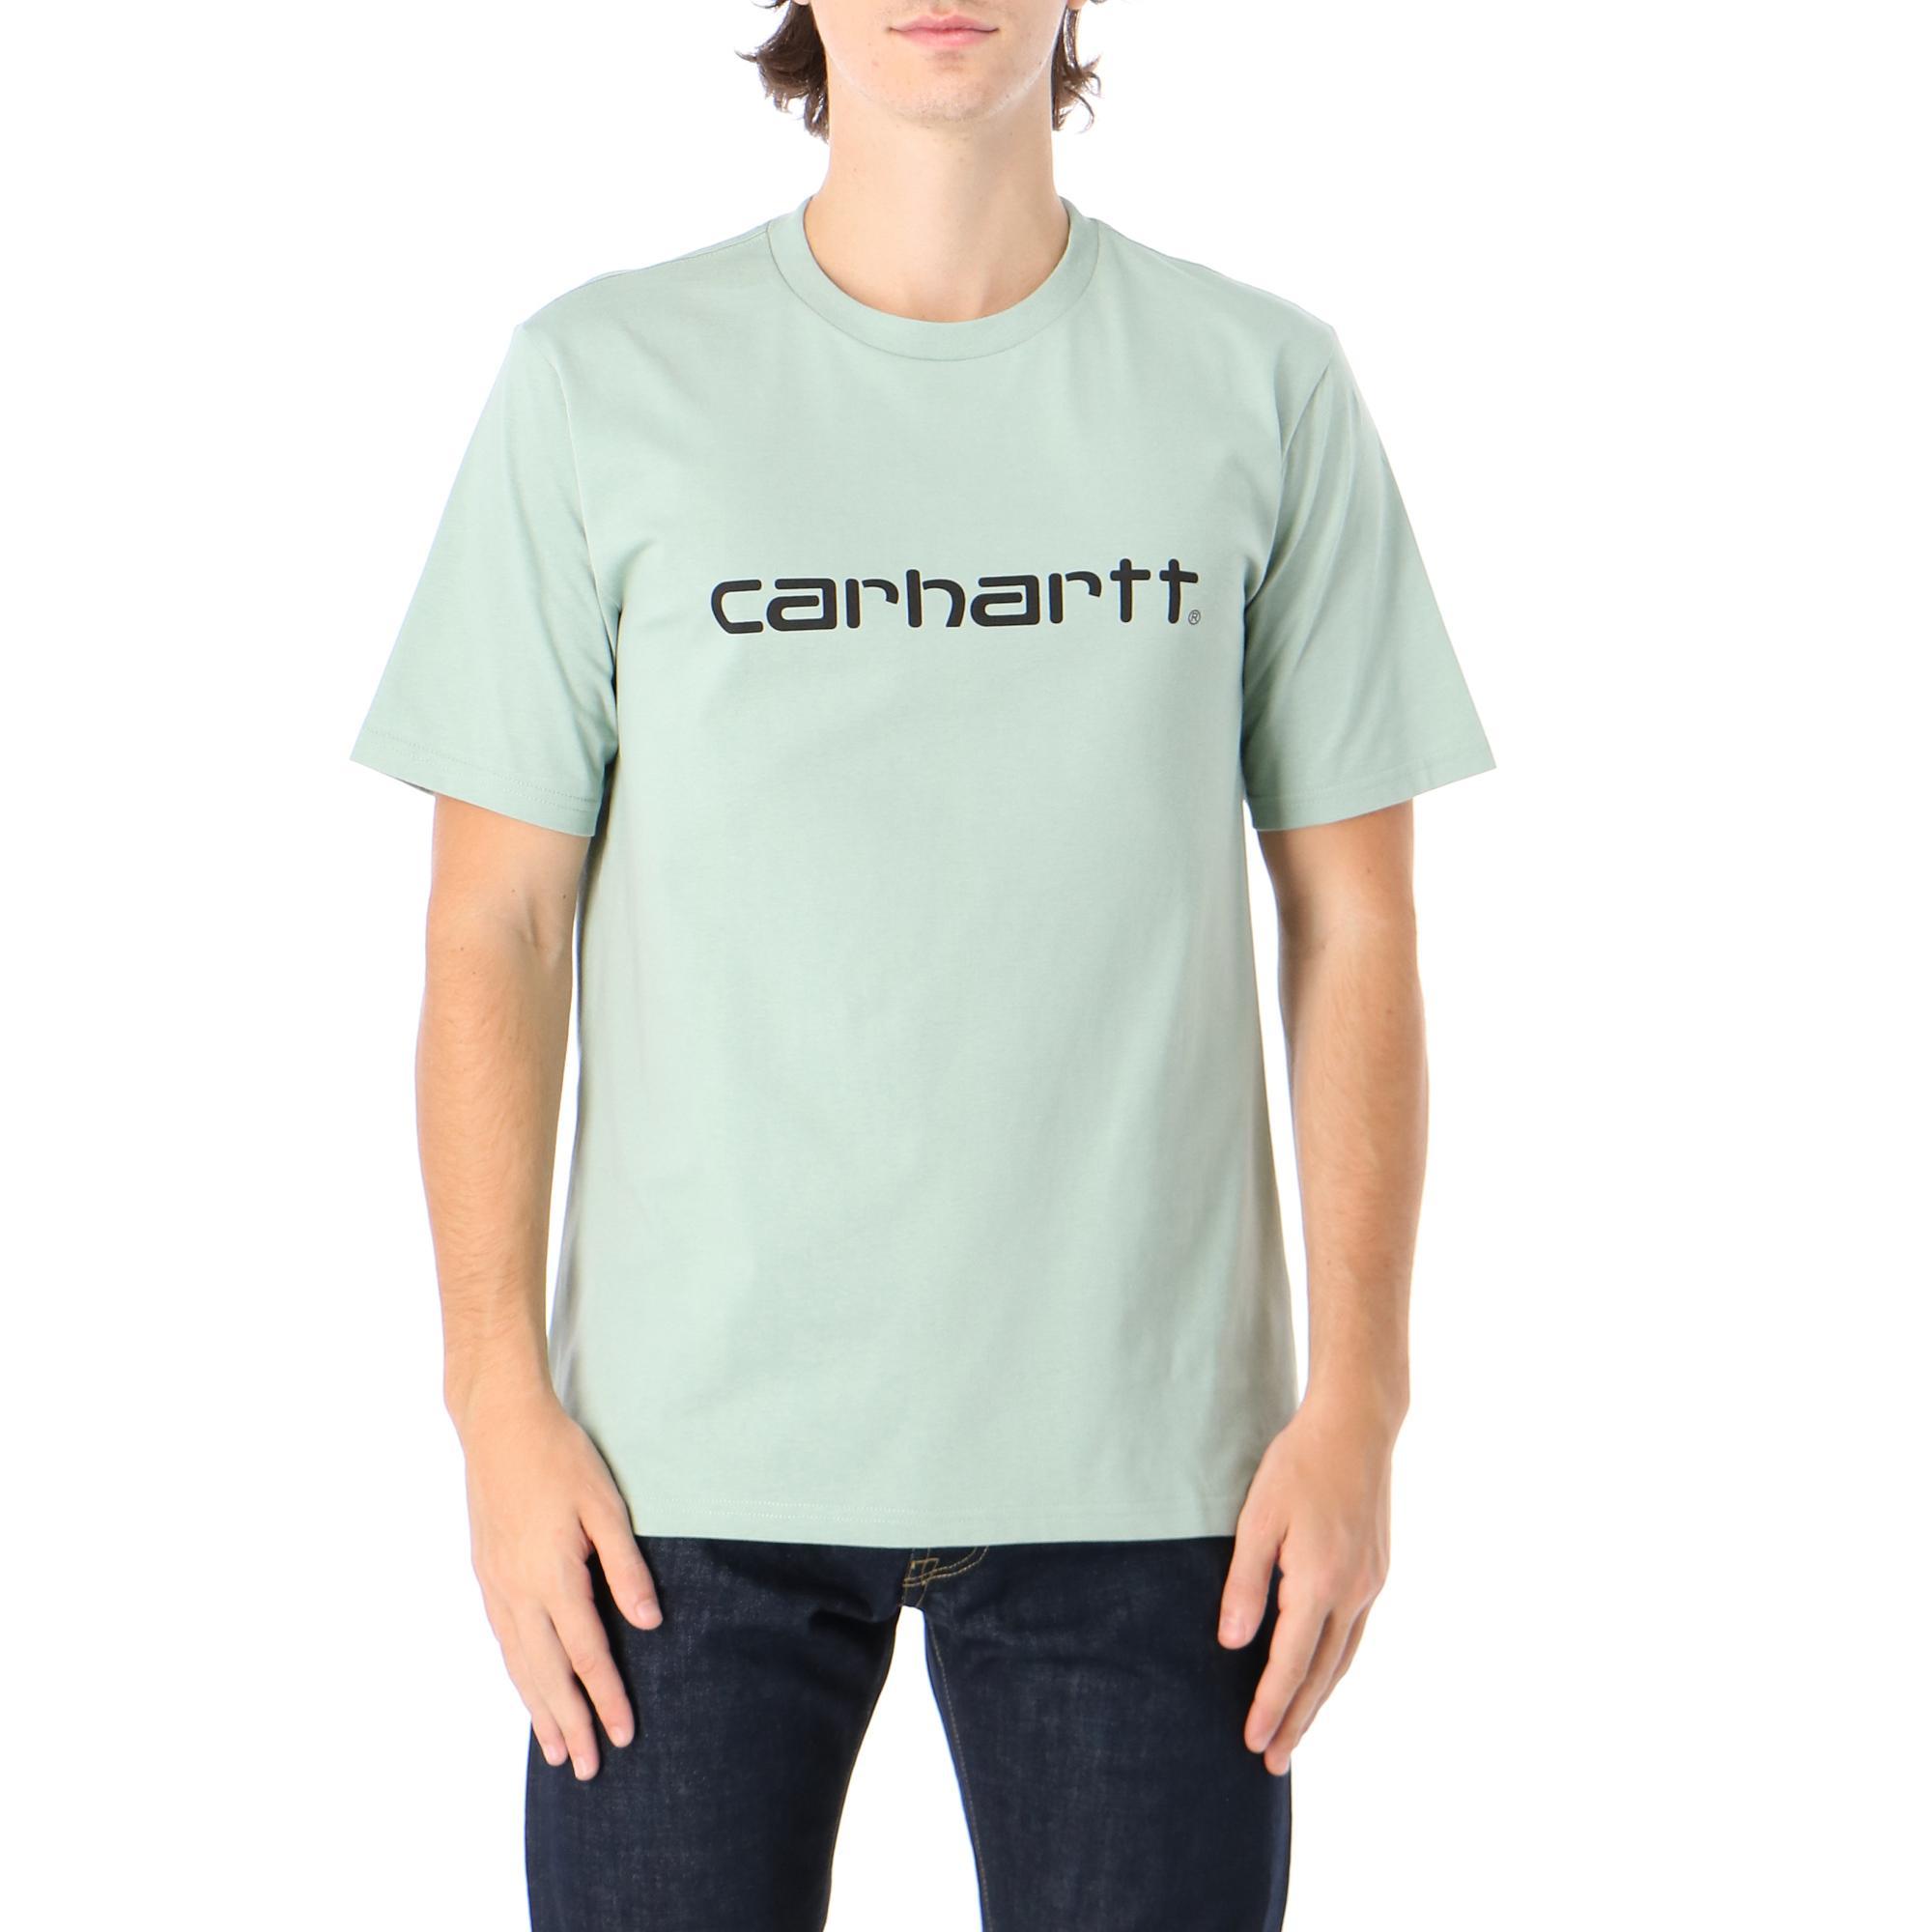 Carhartt S/s Script T-shirt Frosted green black